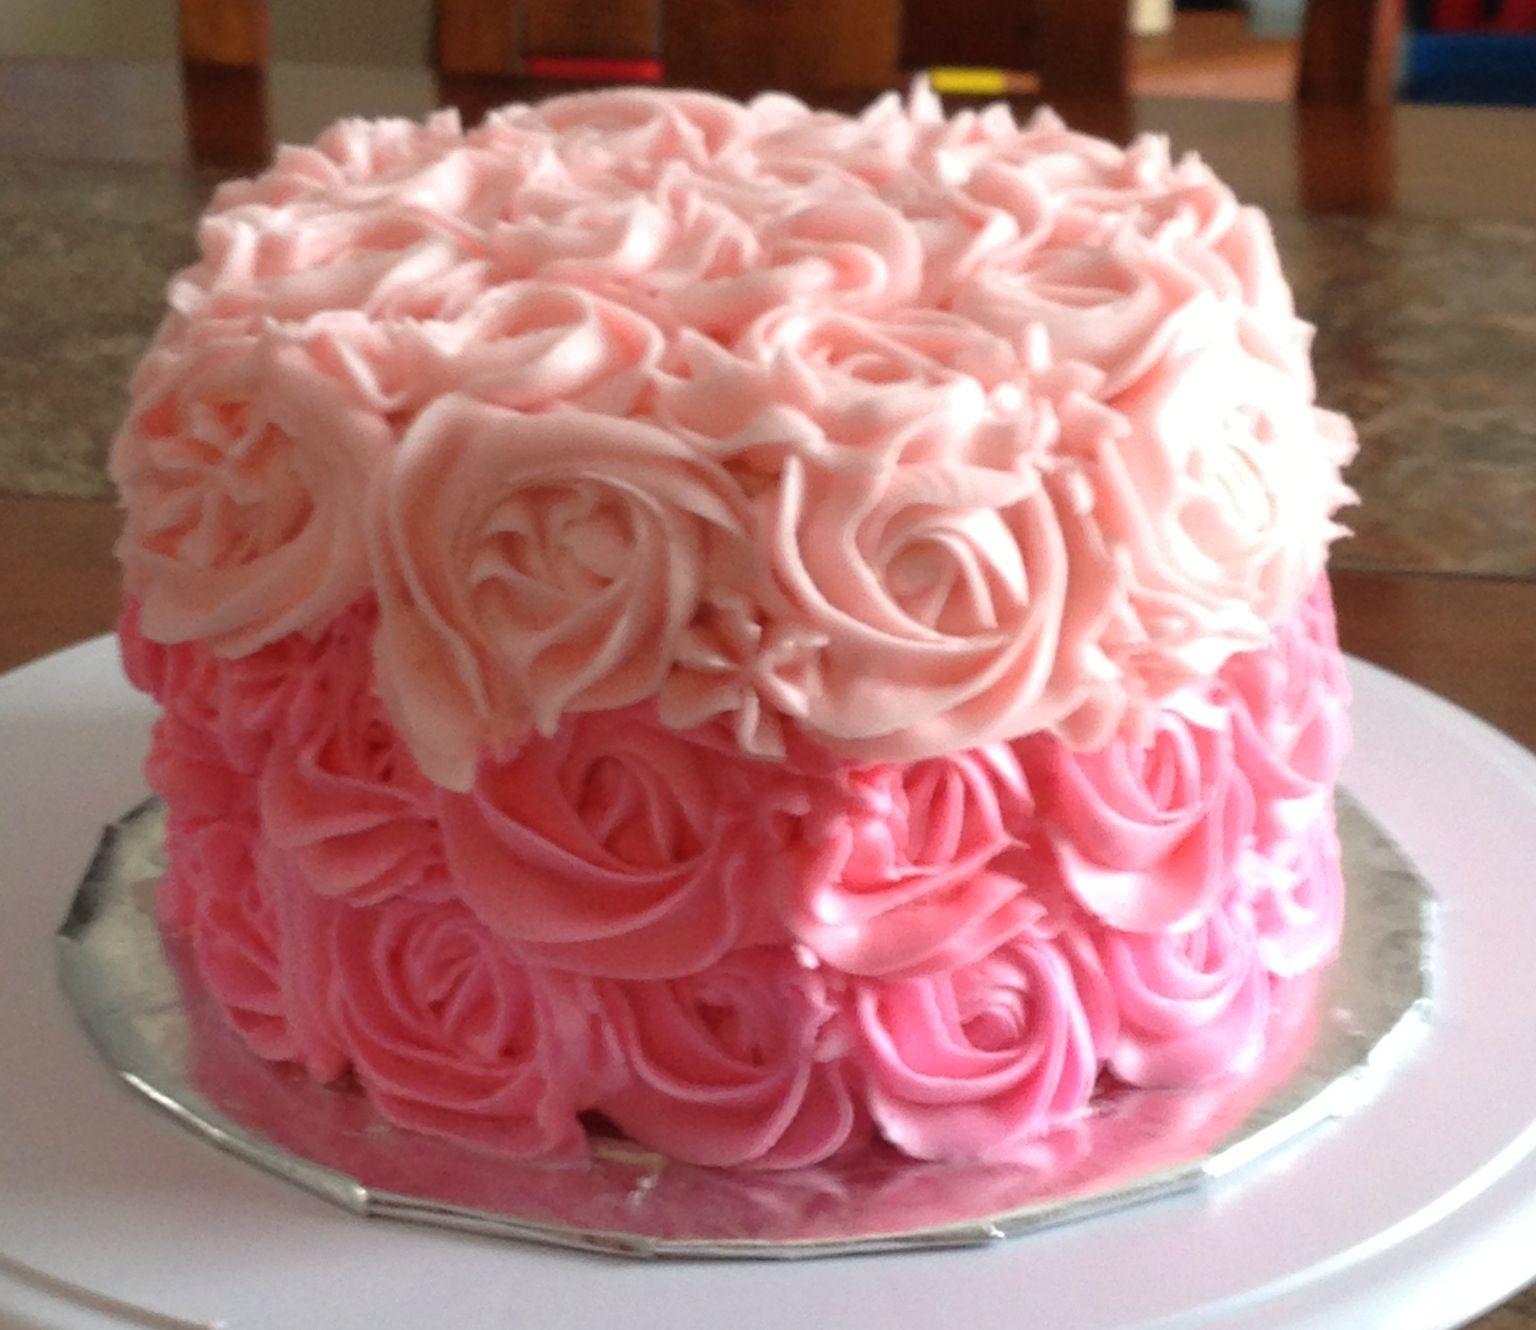 Ombre Pink Rose Cake Using Wilton 2d Tip Rose Cake Decorating Cake Cake Decorating